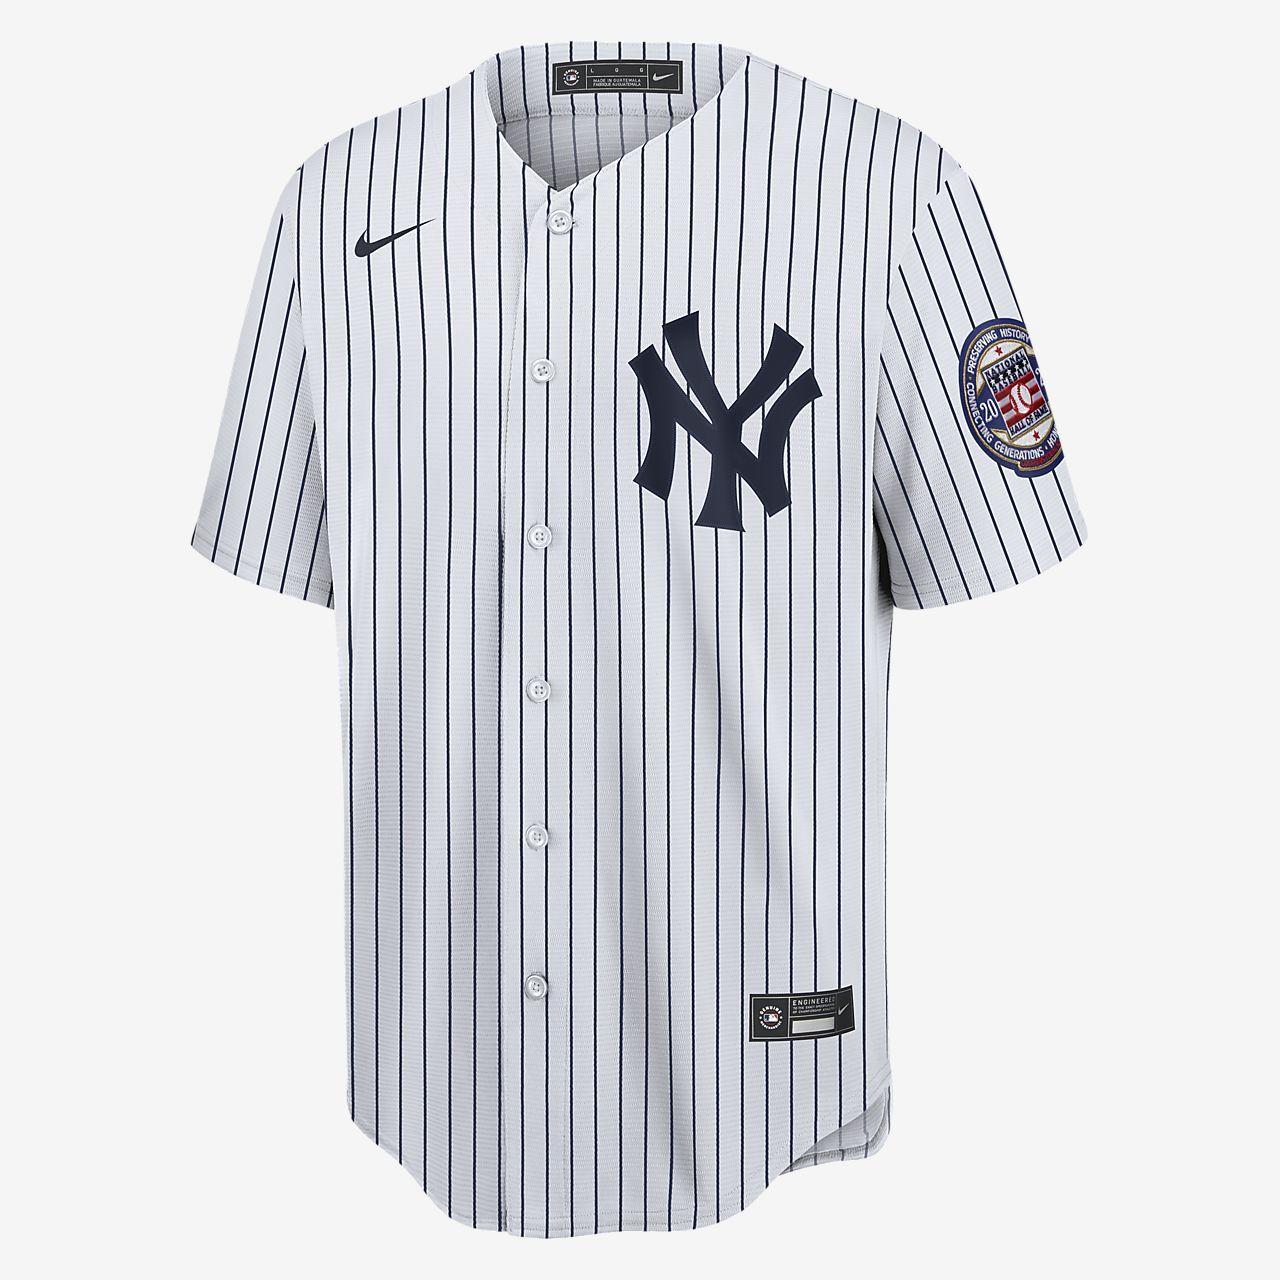 Mlb New York Yankees Derek Jeter Men S Replica Baseball Jersey Nike Com In 2020 New York Yankees Baseball Jerseys Derek Jeter